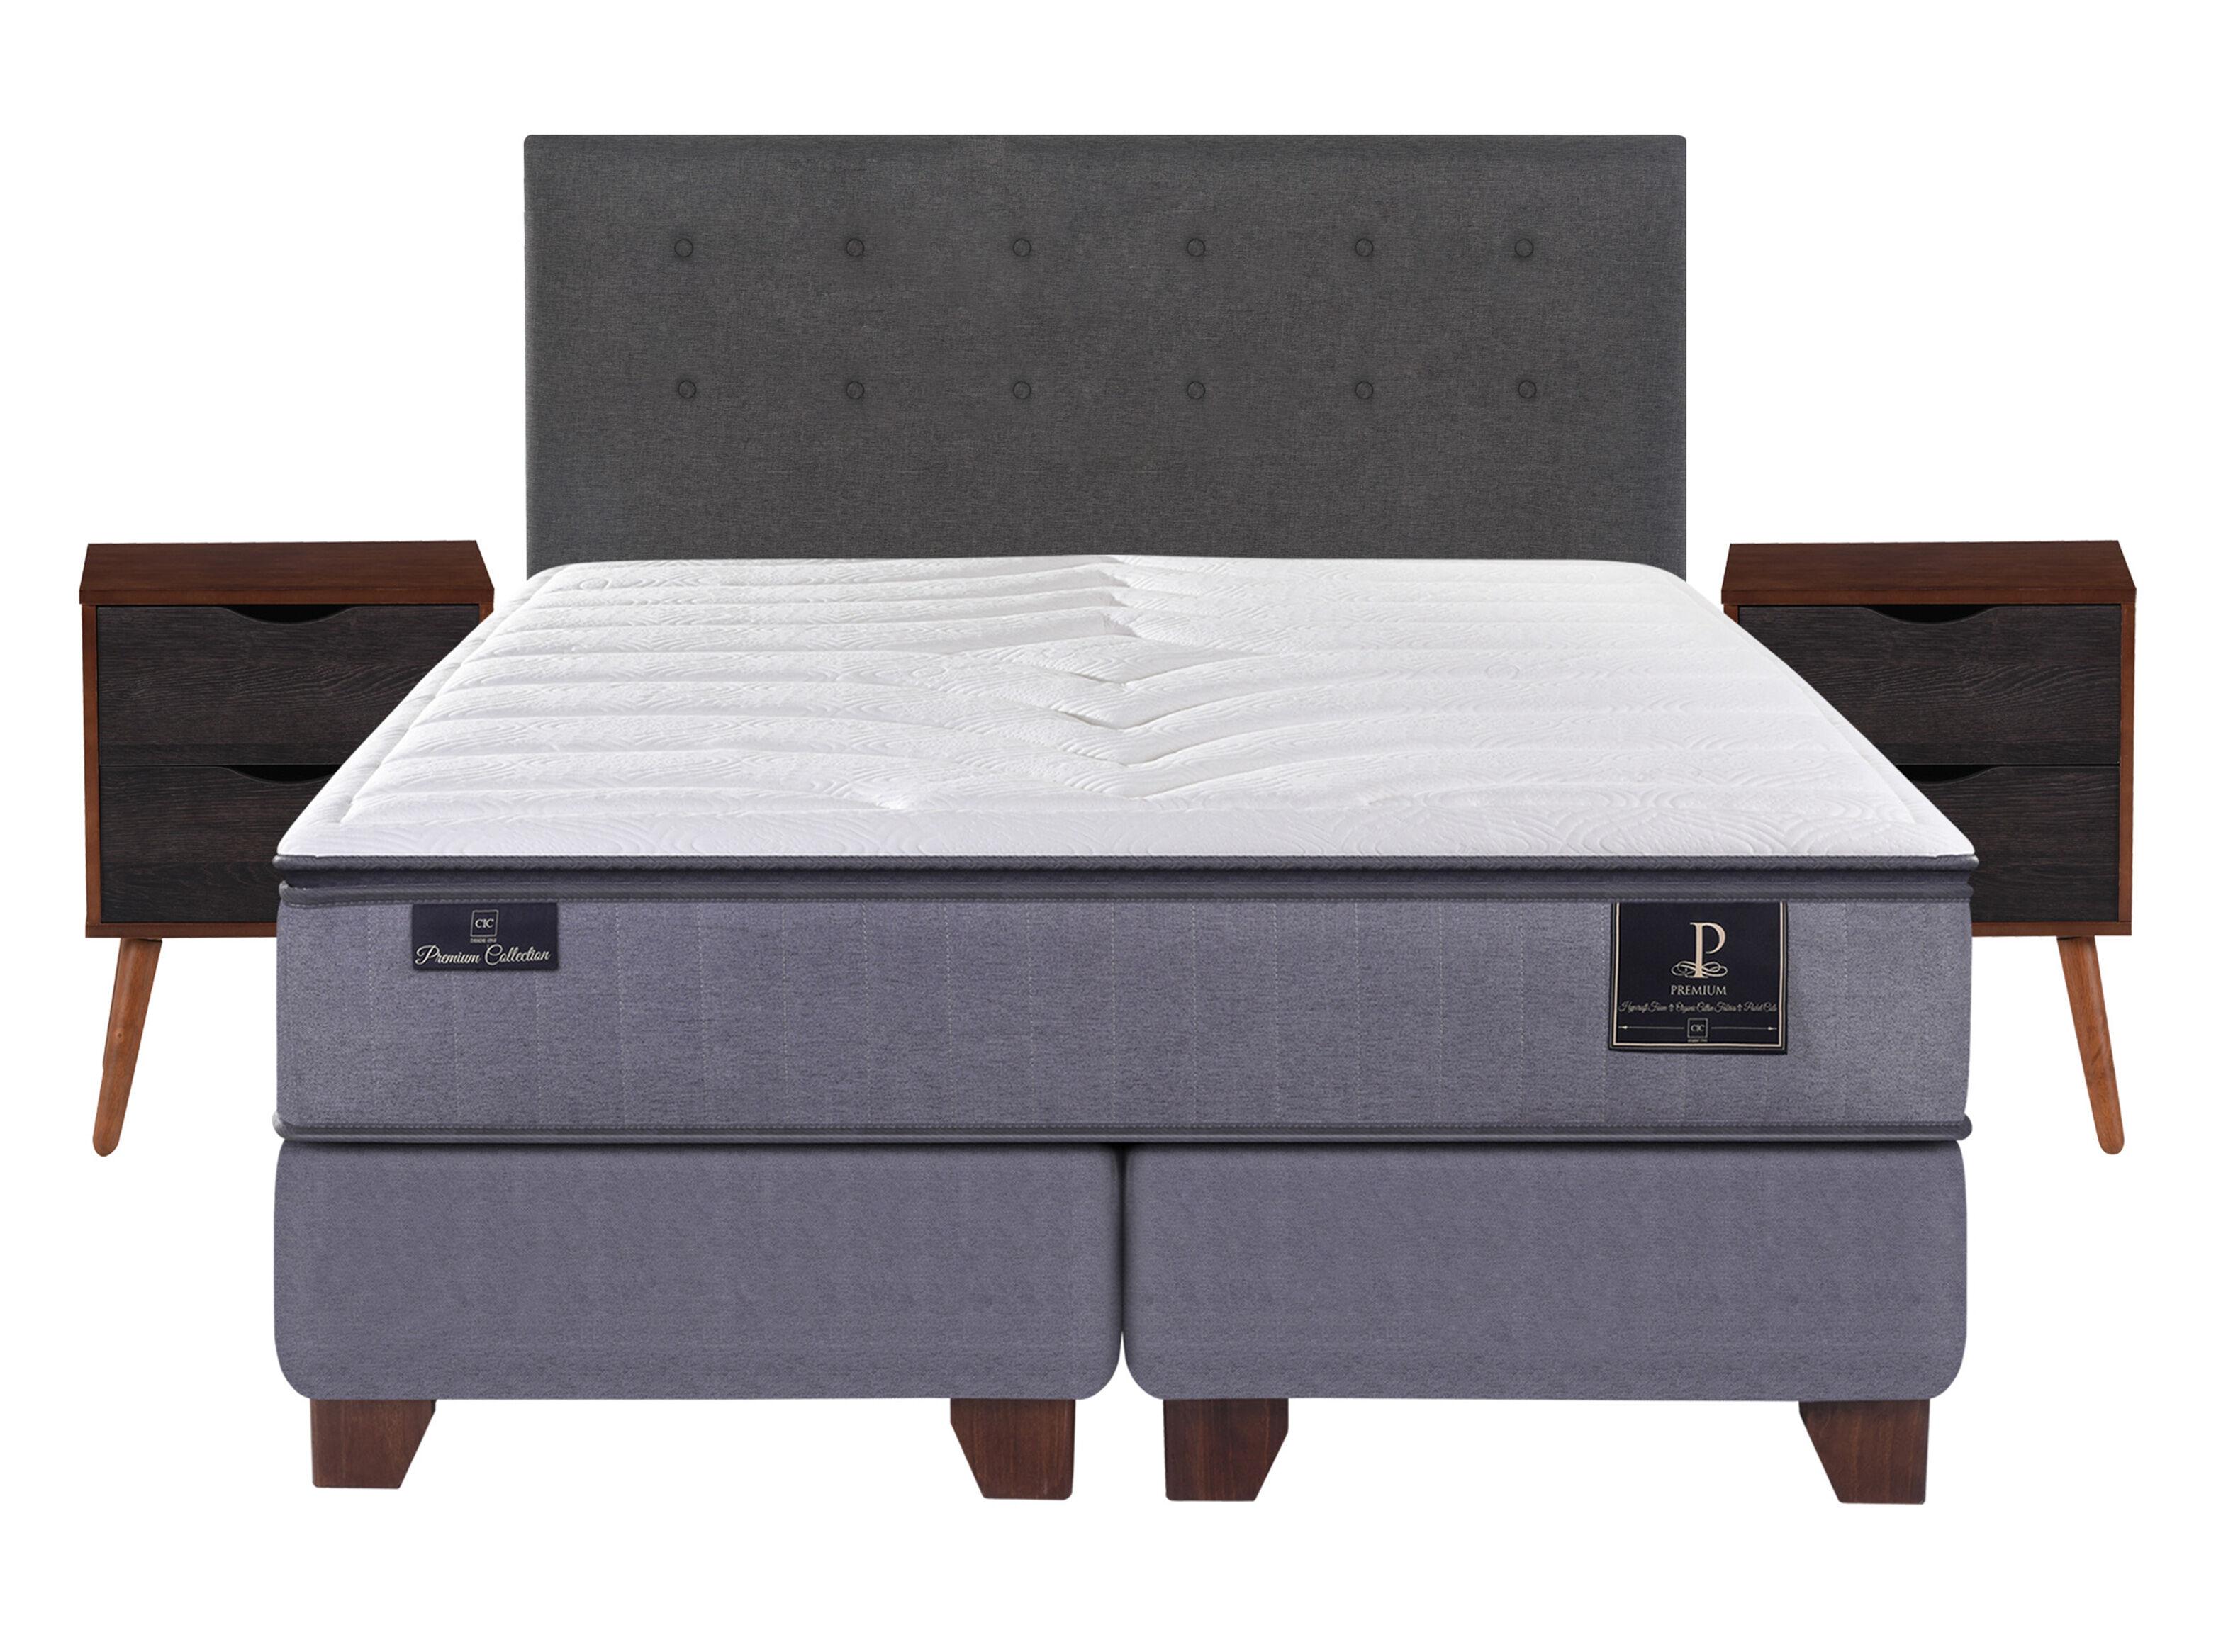 Box Spring Premium 2 Plazas Base Dividida + Set Muebles Eufrates Cic